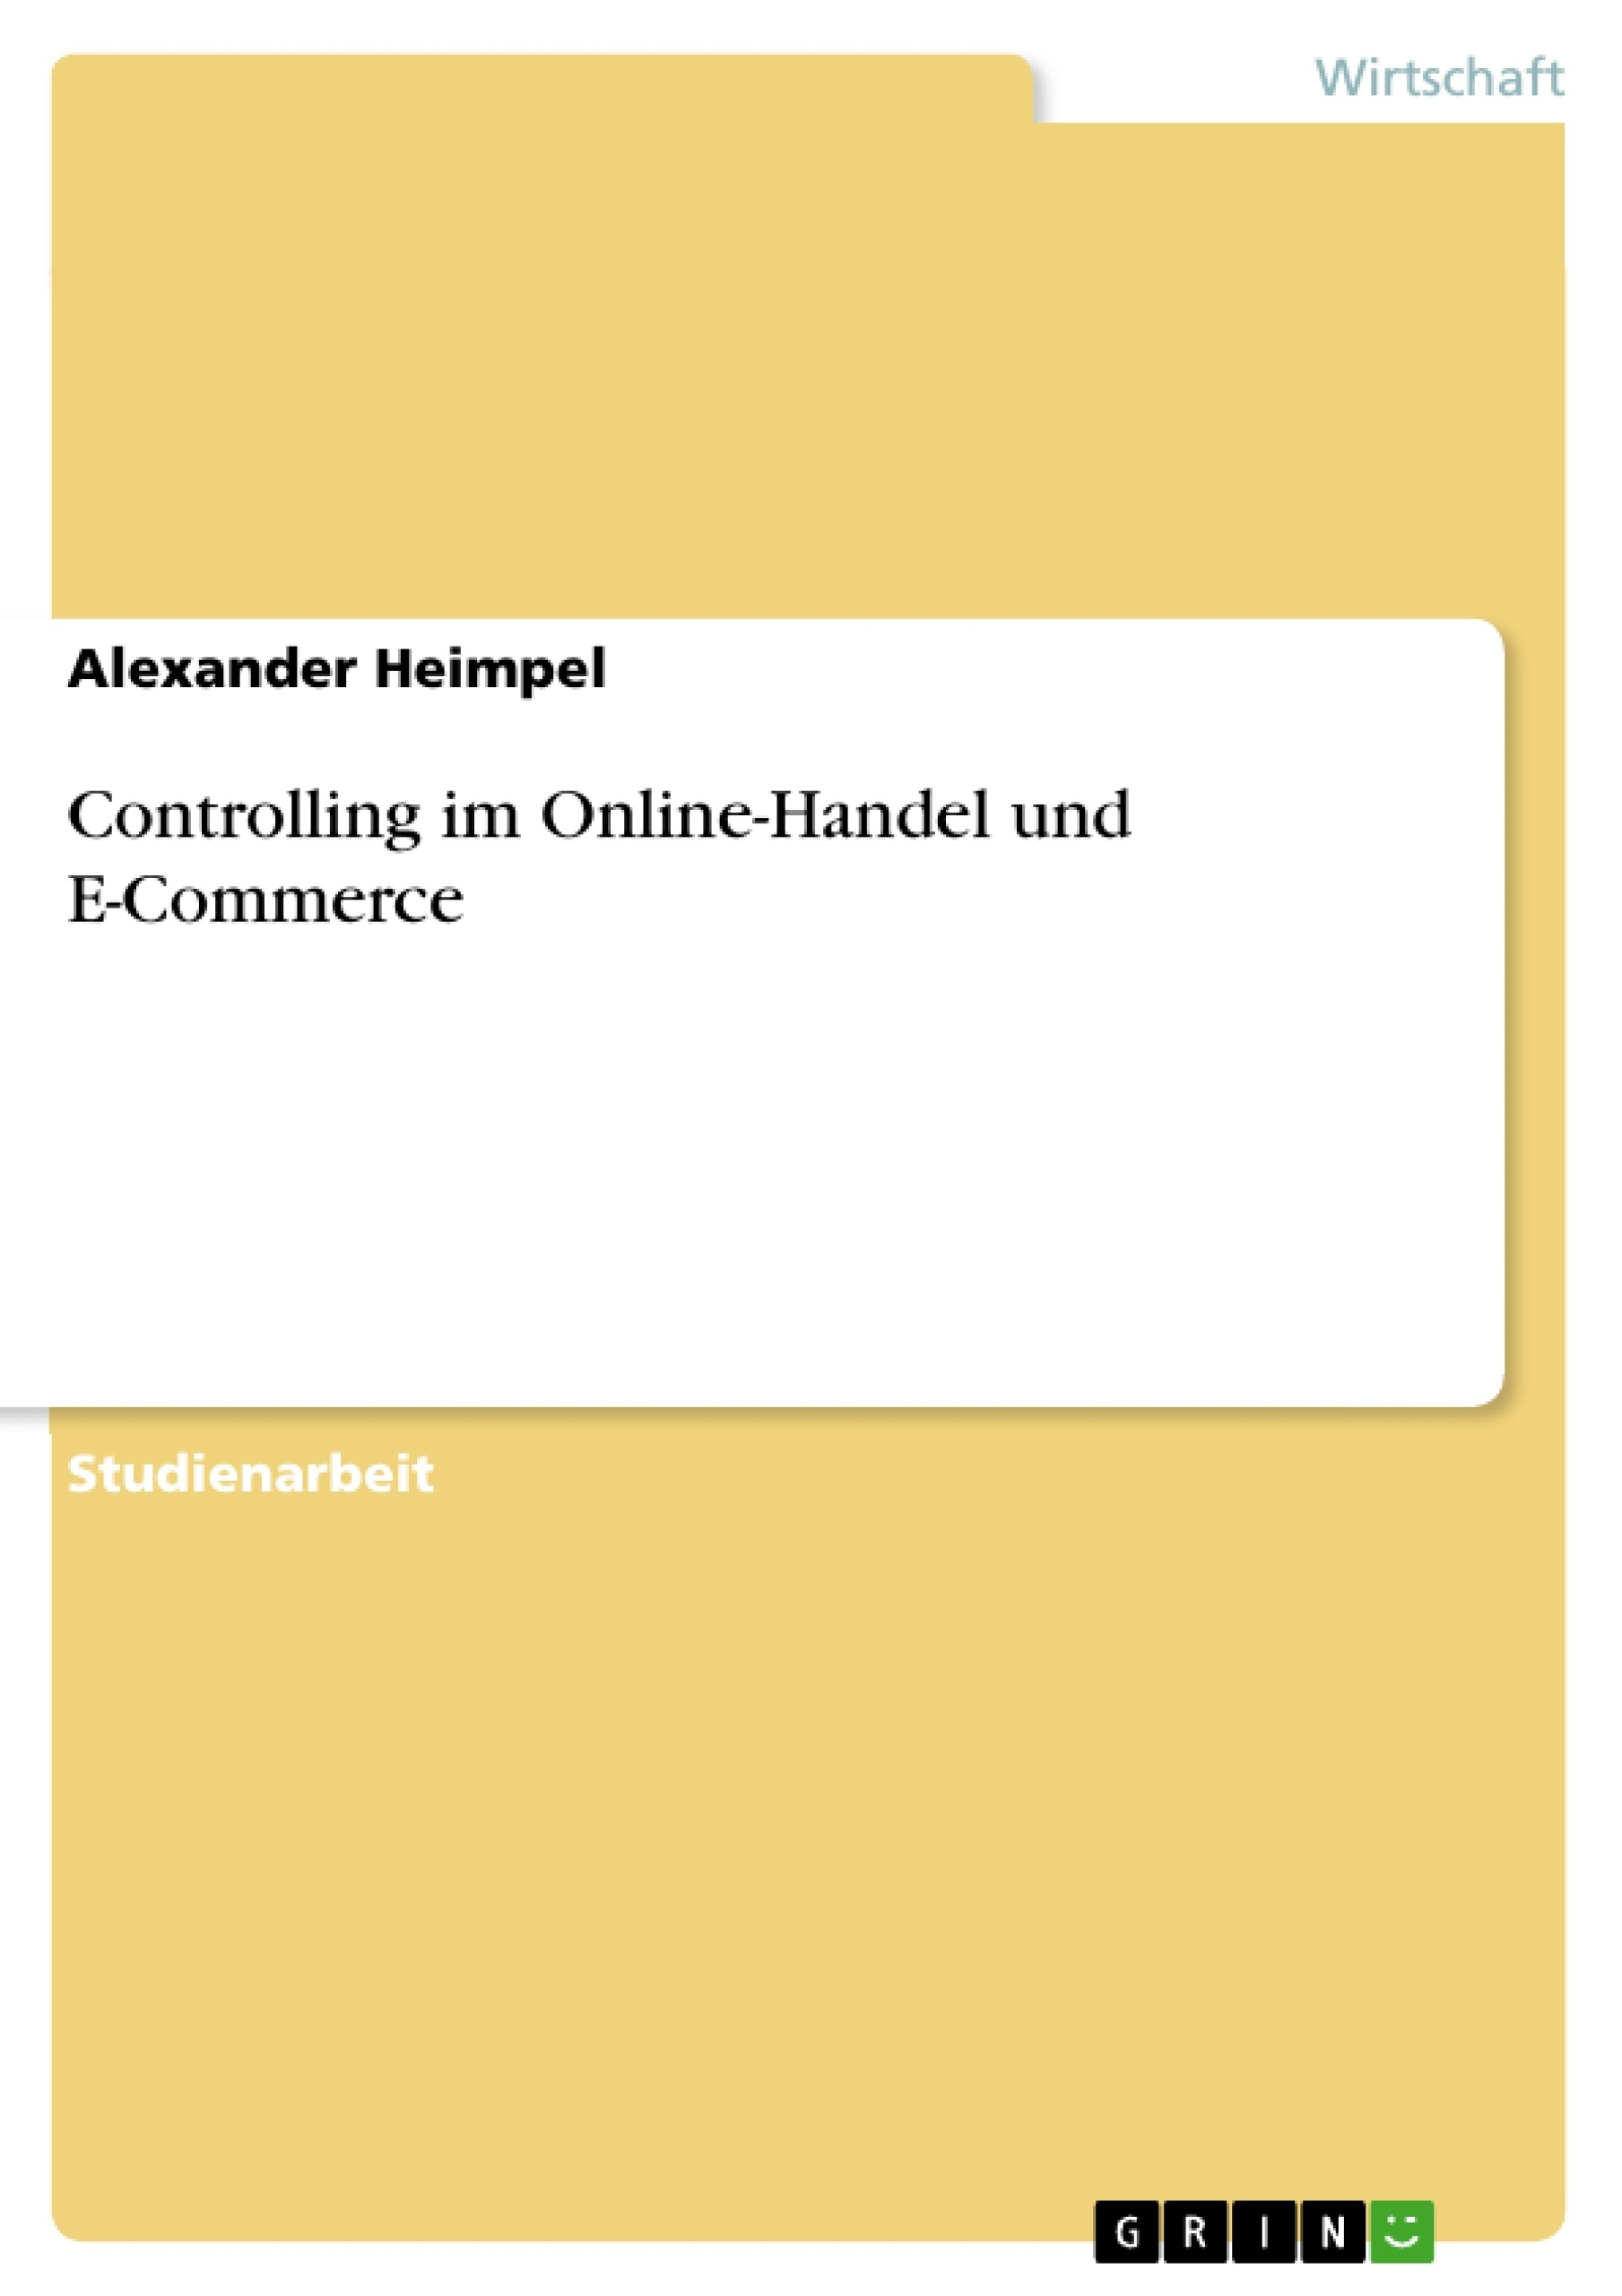 Titel: Controlling im Online-Handel und E-Commerce